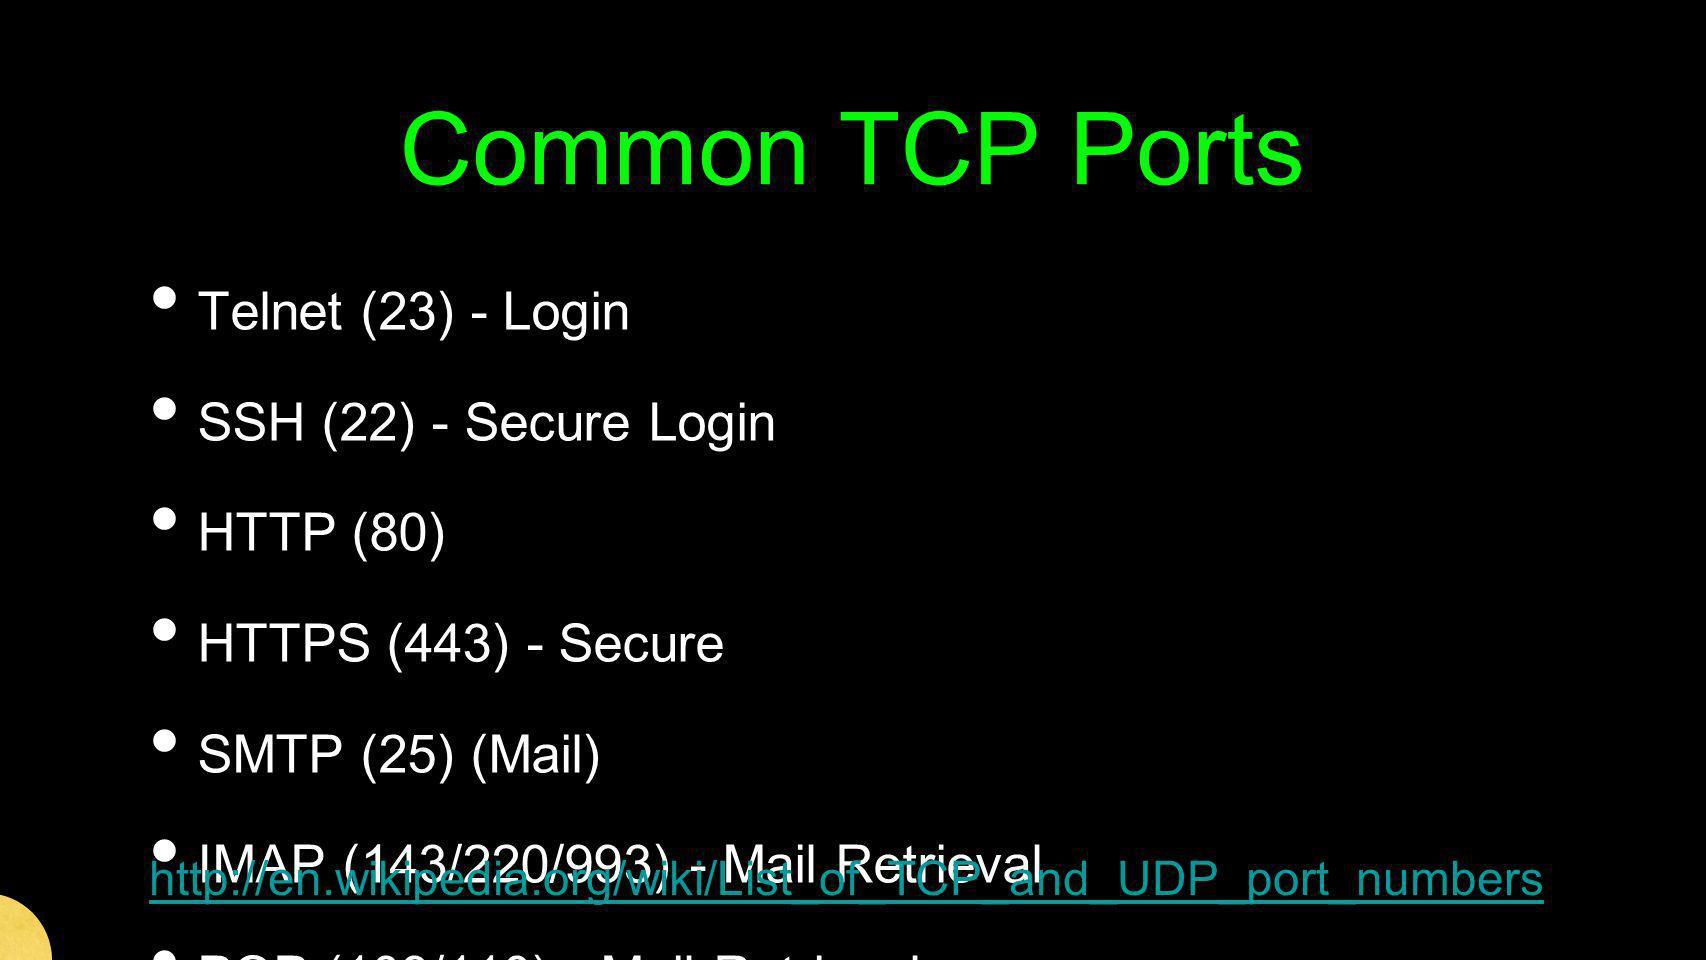 Common TCP Ports Telnet (23) - Login SSH (22) - Secure Login HTTP (80) HTTPS (443) - Secure SMTP (25) (Mail) IMAP (143/220/993) - Mail Retrieval POP (